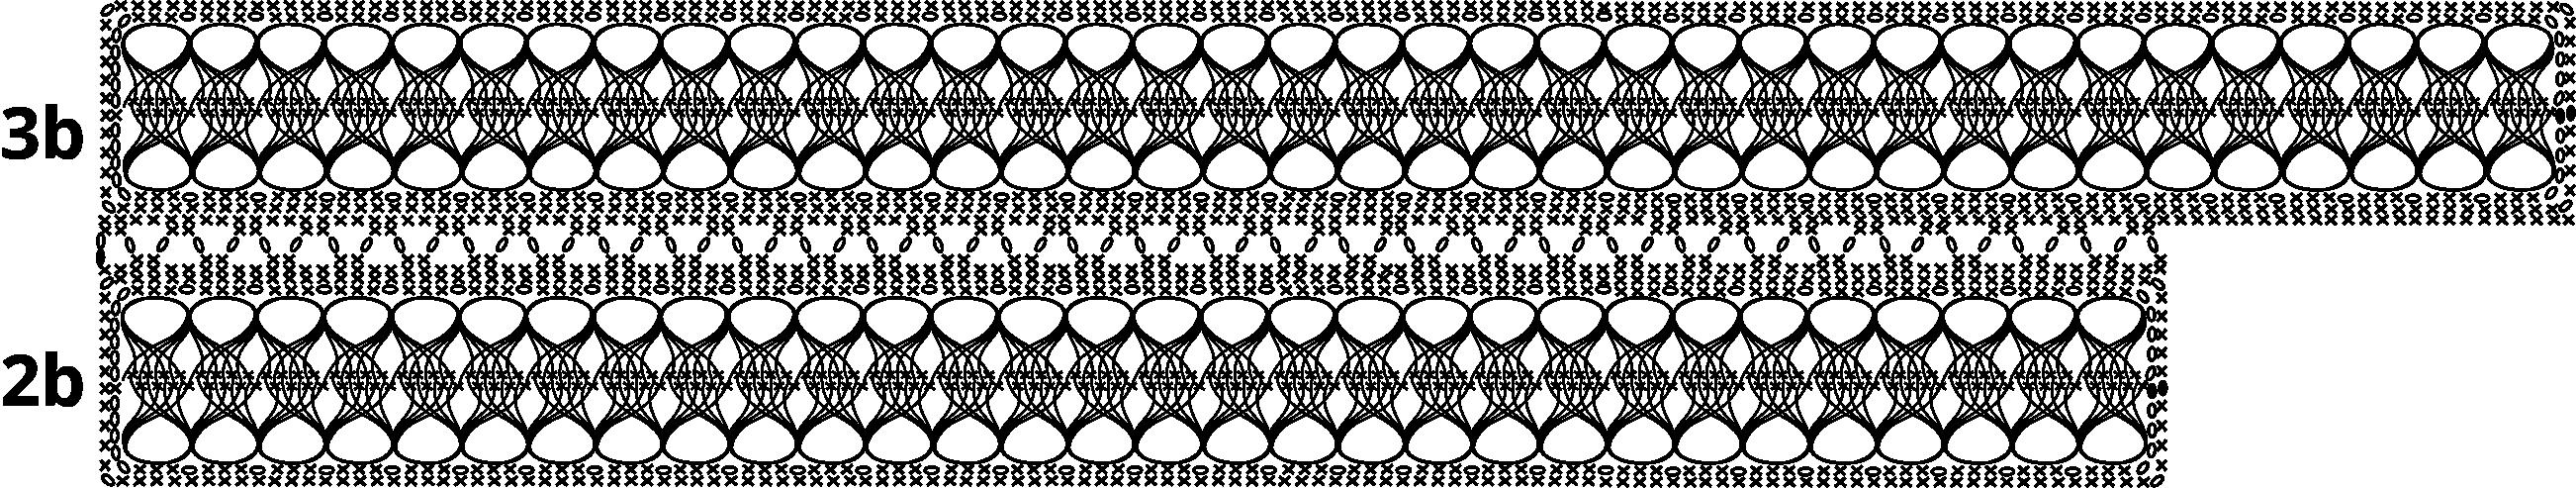 Gratis guimpepatroon - bruinzwarte trui - baan 2b-3b